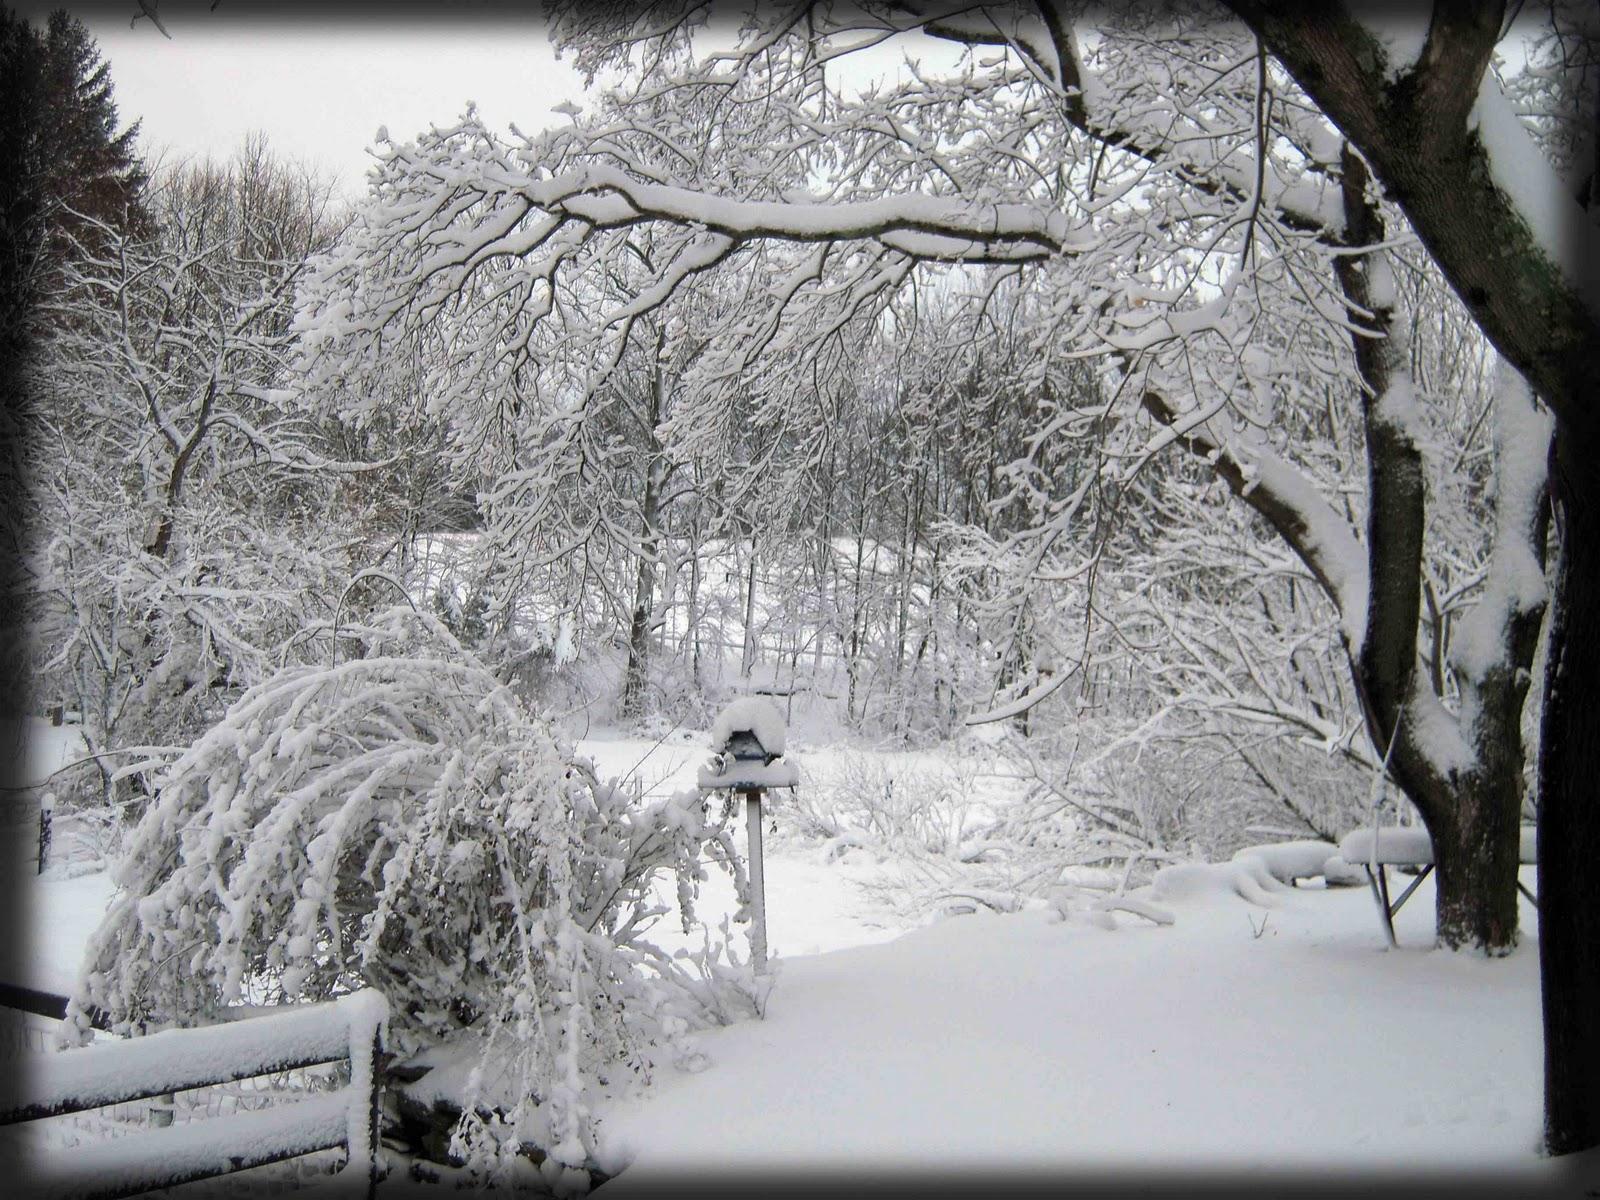 Meadow Creek Farm Scenic Snow Storm